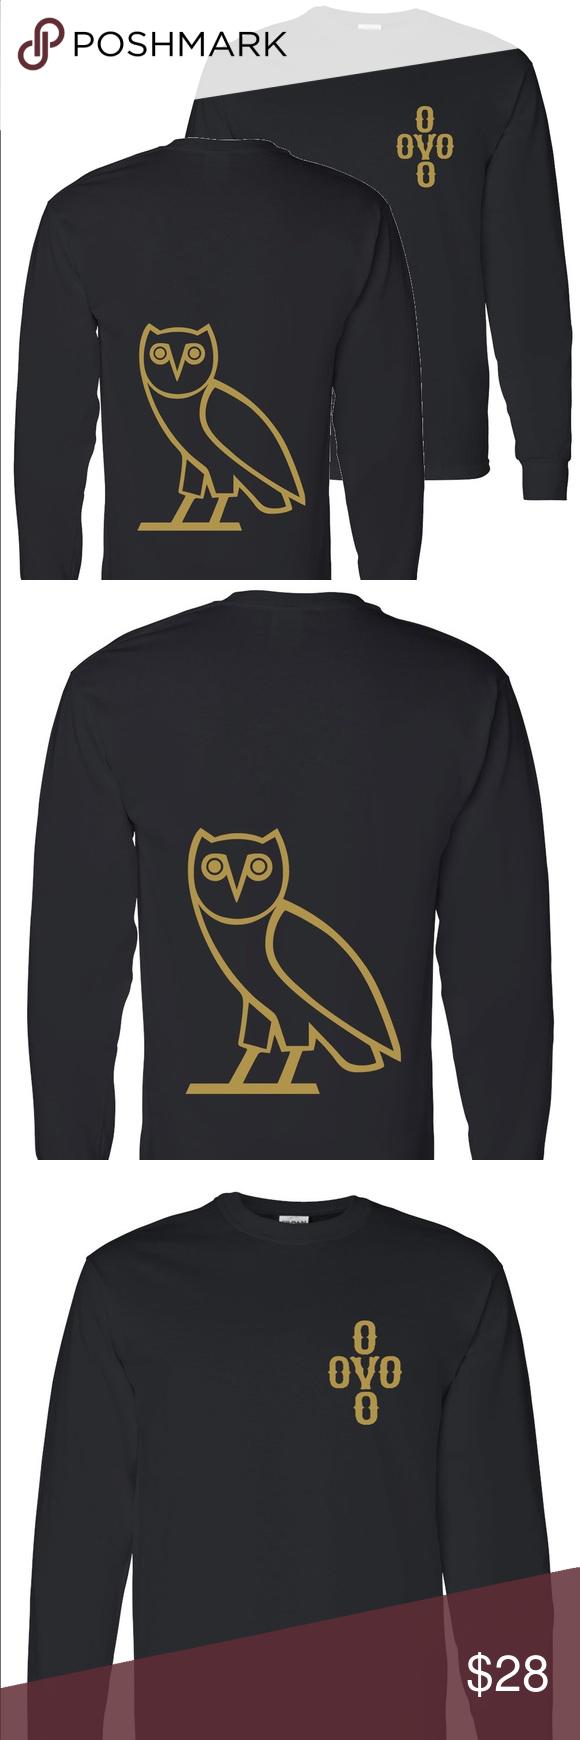 97bee980f Drake Night Shirts Ebay